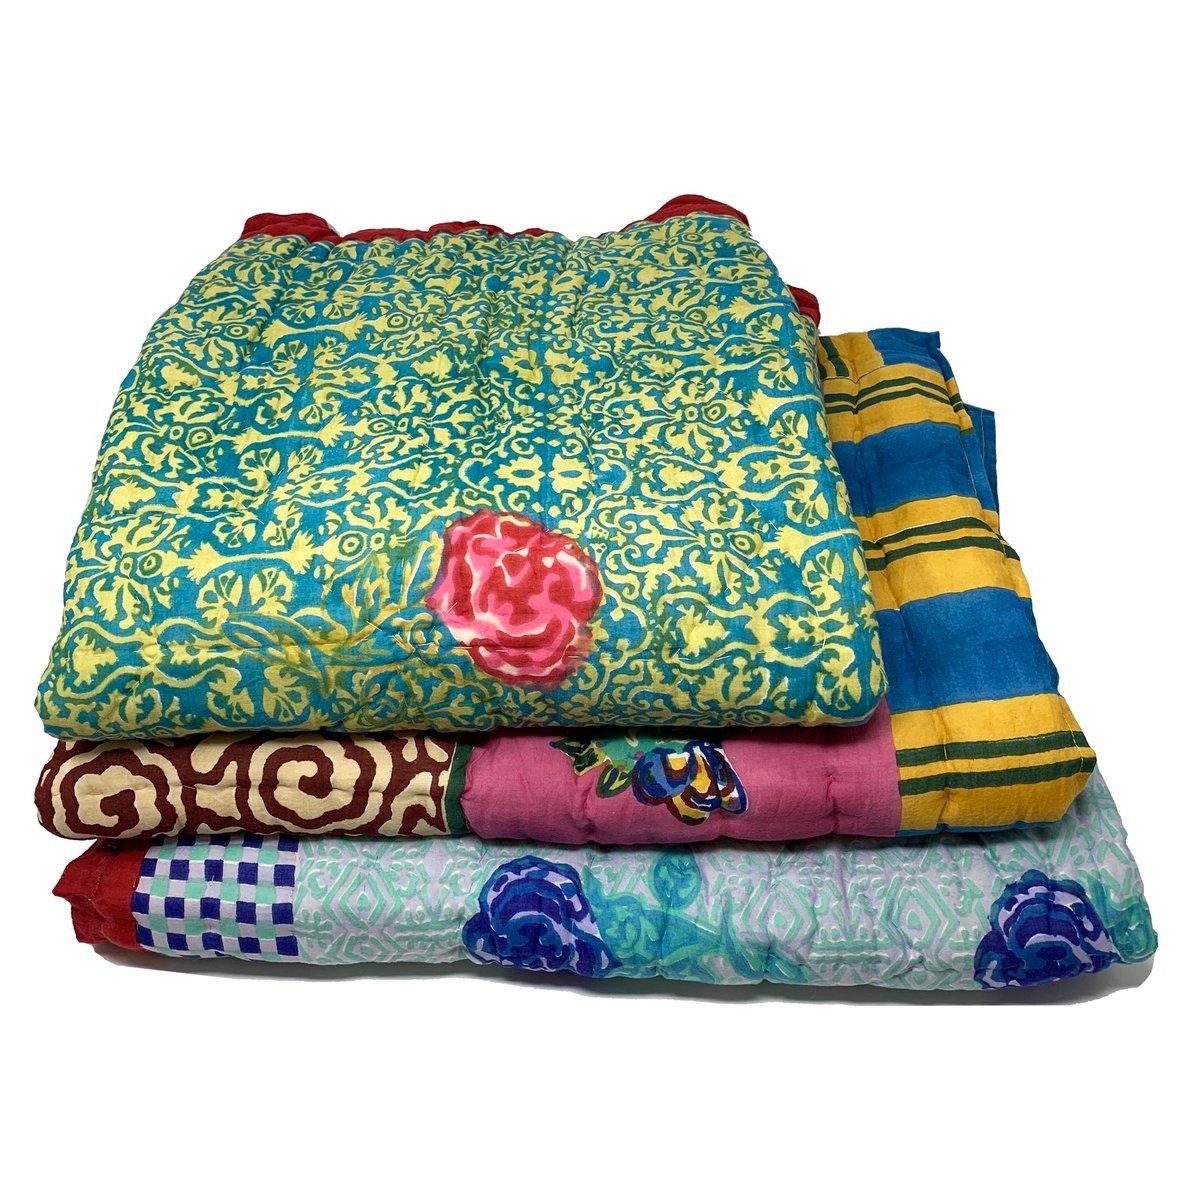 Image of Lisa Corti Baby Blankets